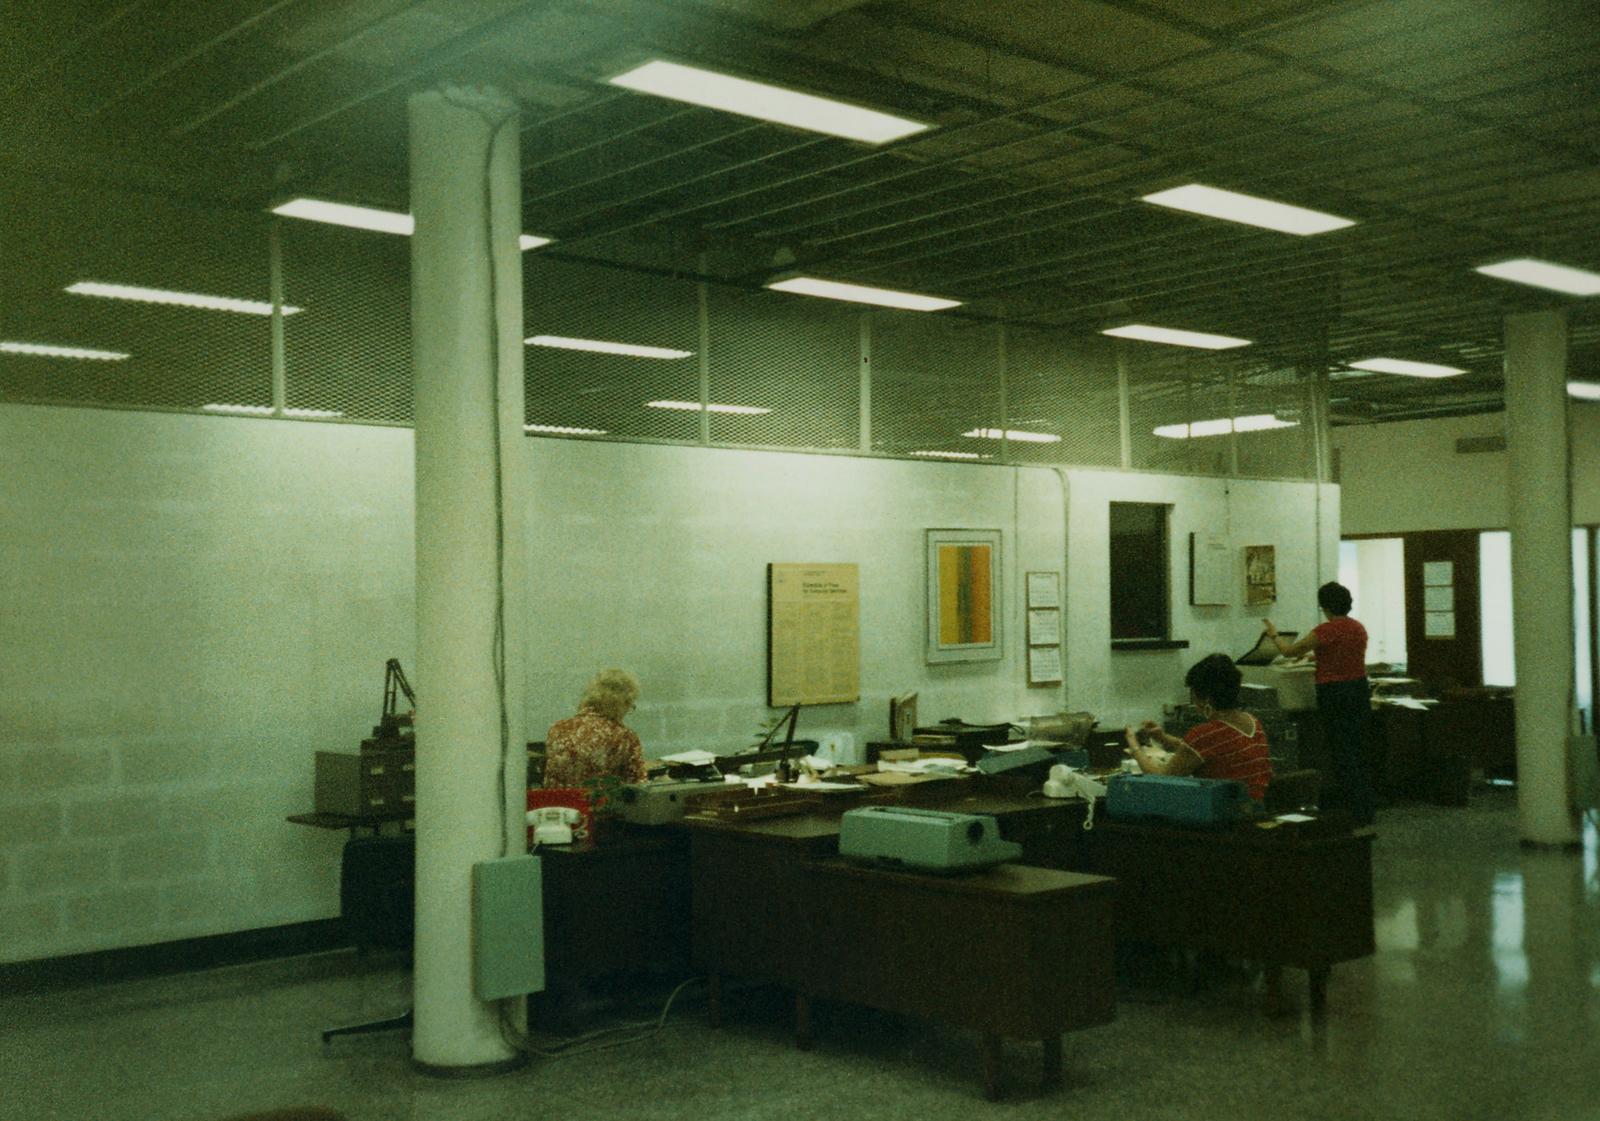 Havana - Chancery Office Building - 1988